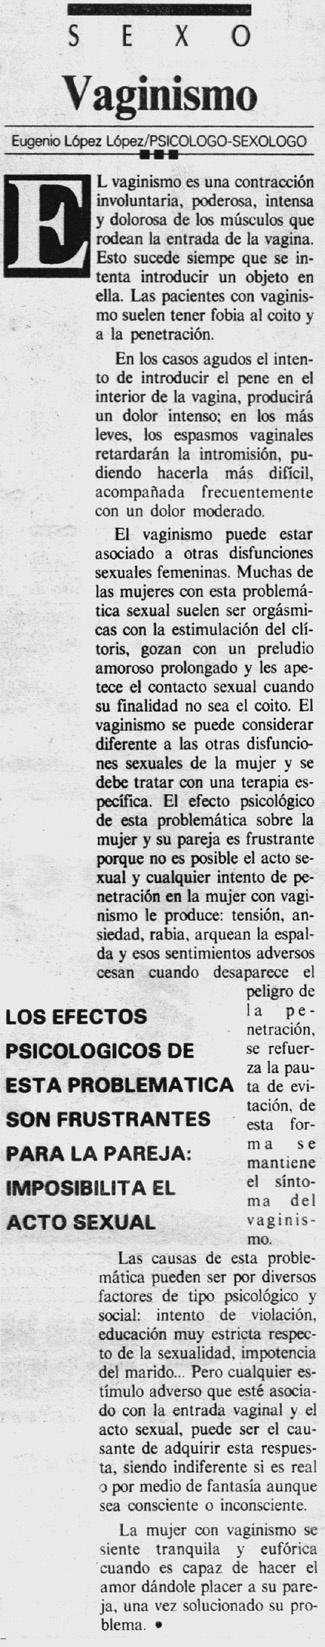 1991-06-16-p